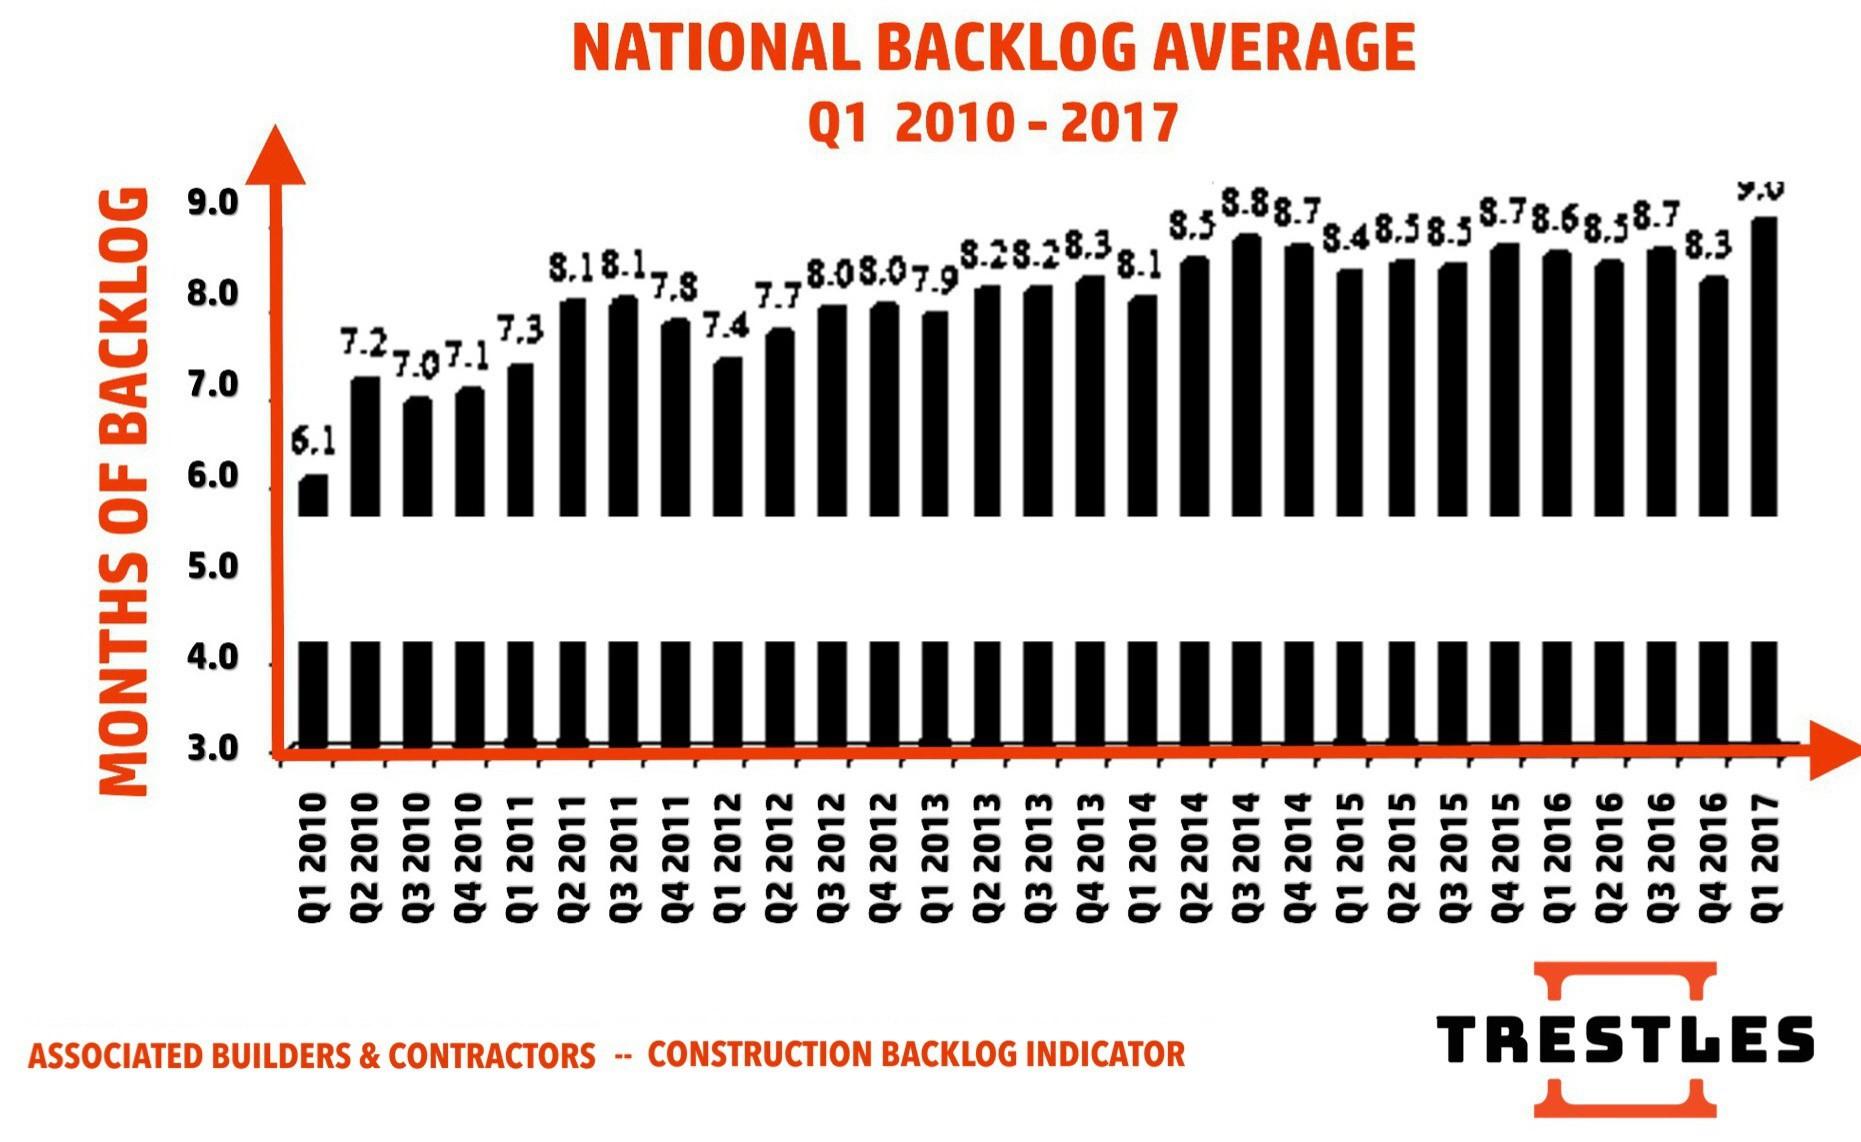 TRESTLES - National Backlog Average for Q1 2010-2017